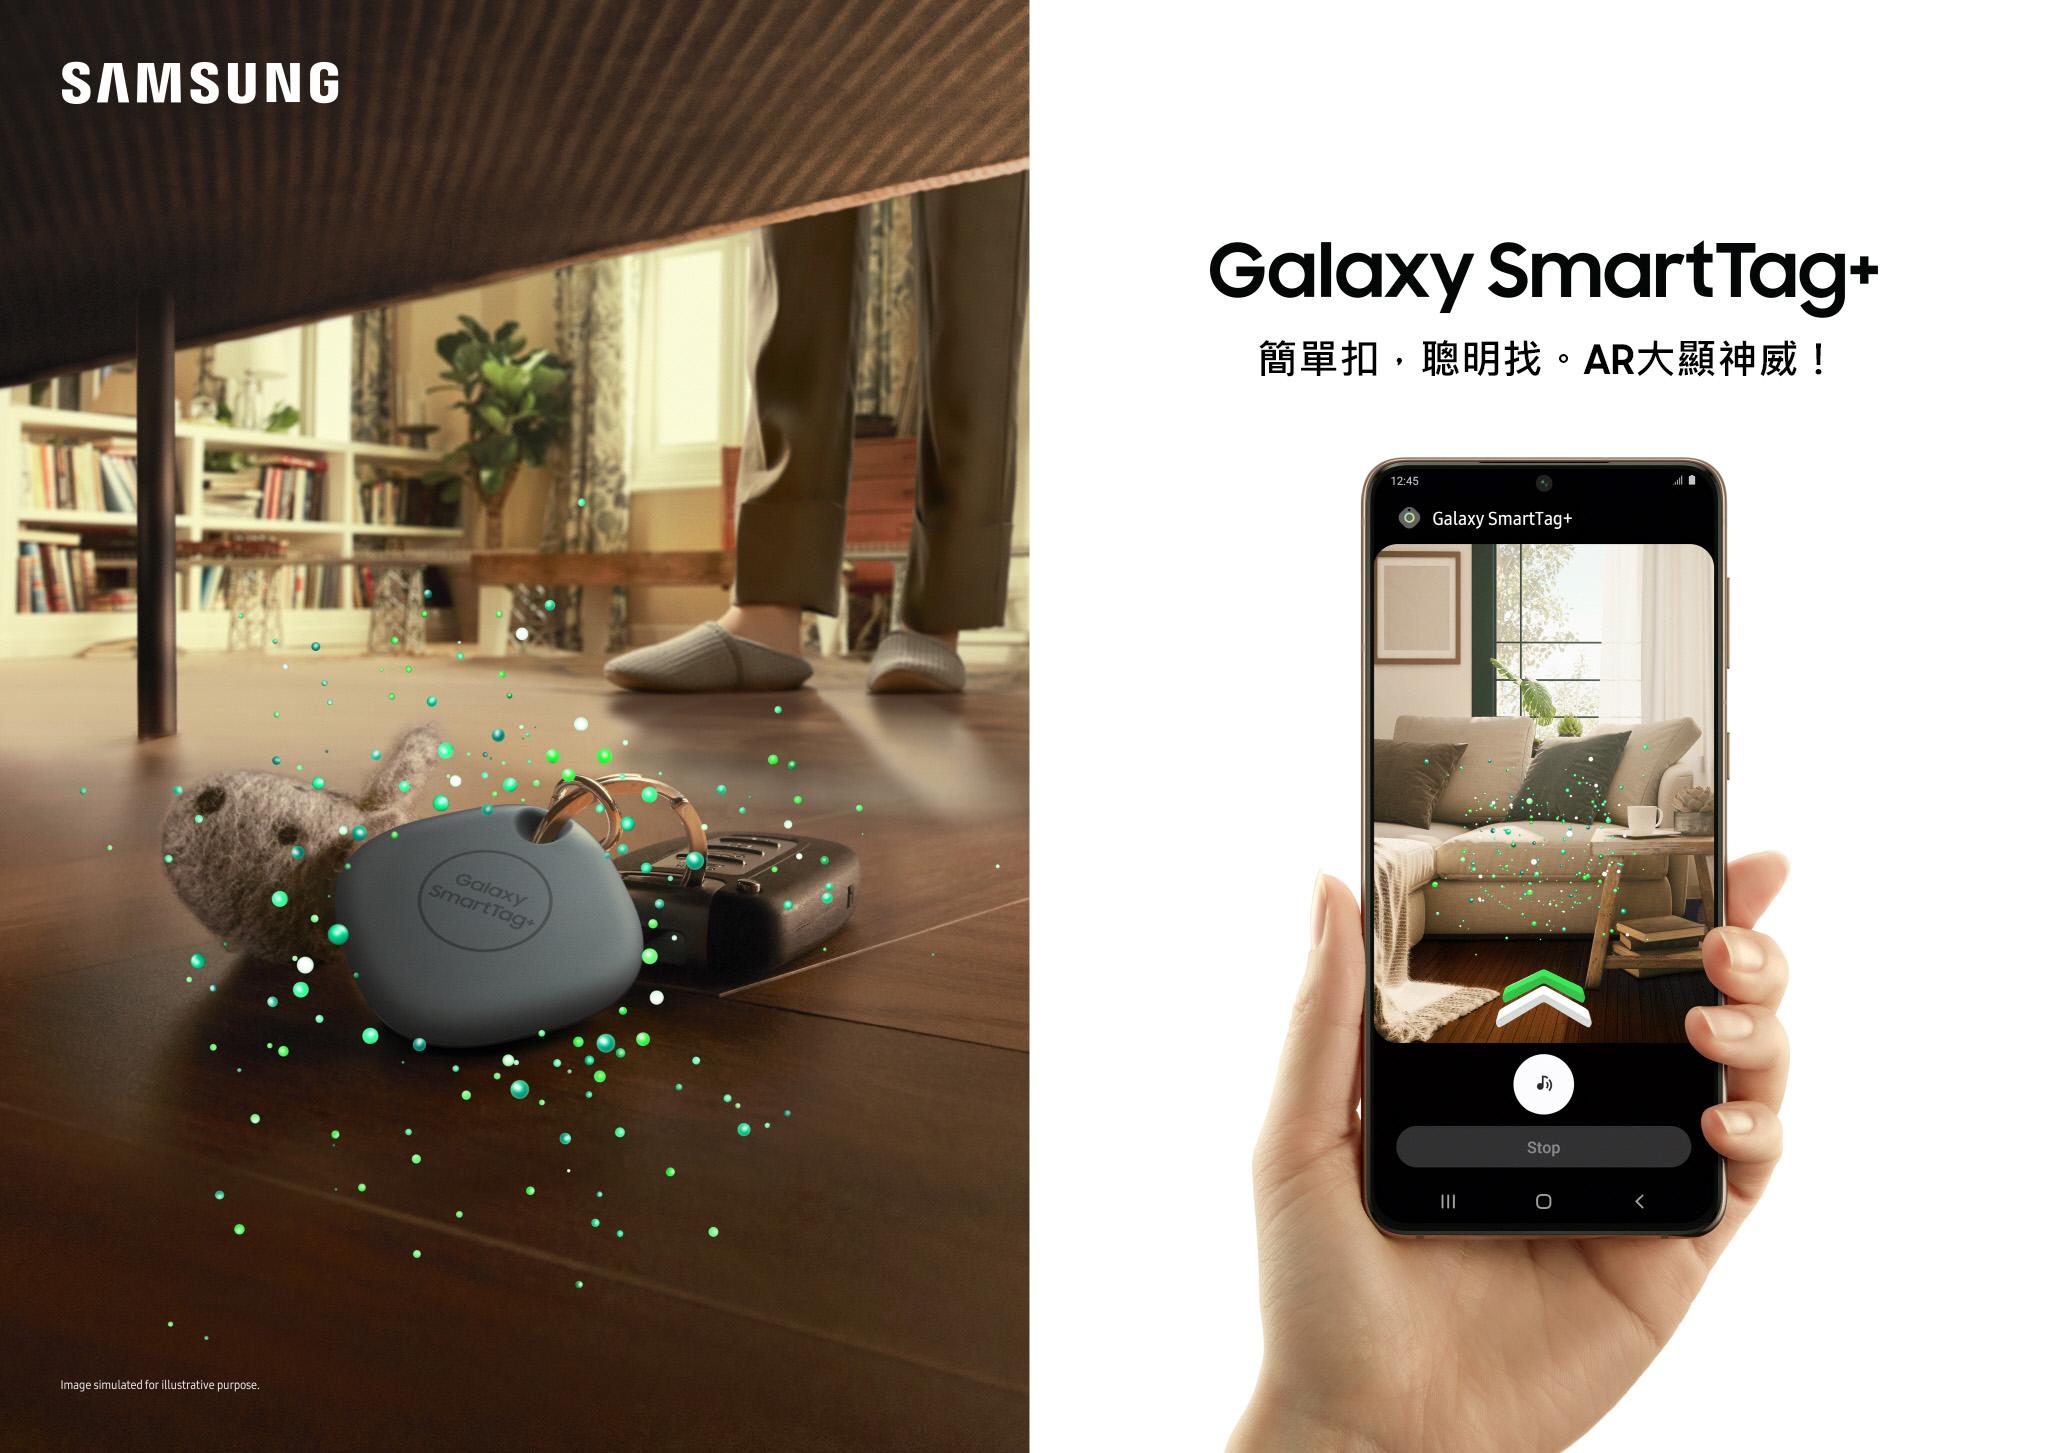 Galaxy SmartTag + Evolution首次亮相:寻找失物招领处更聪明-三星新闻室墨西哥